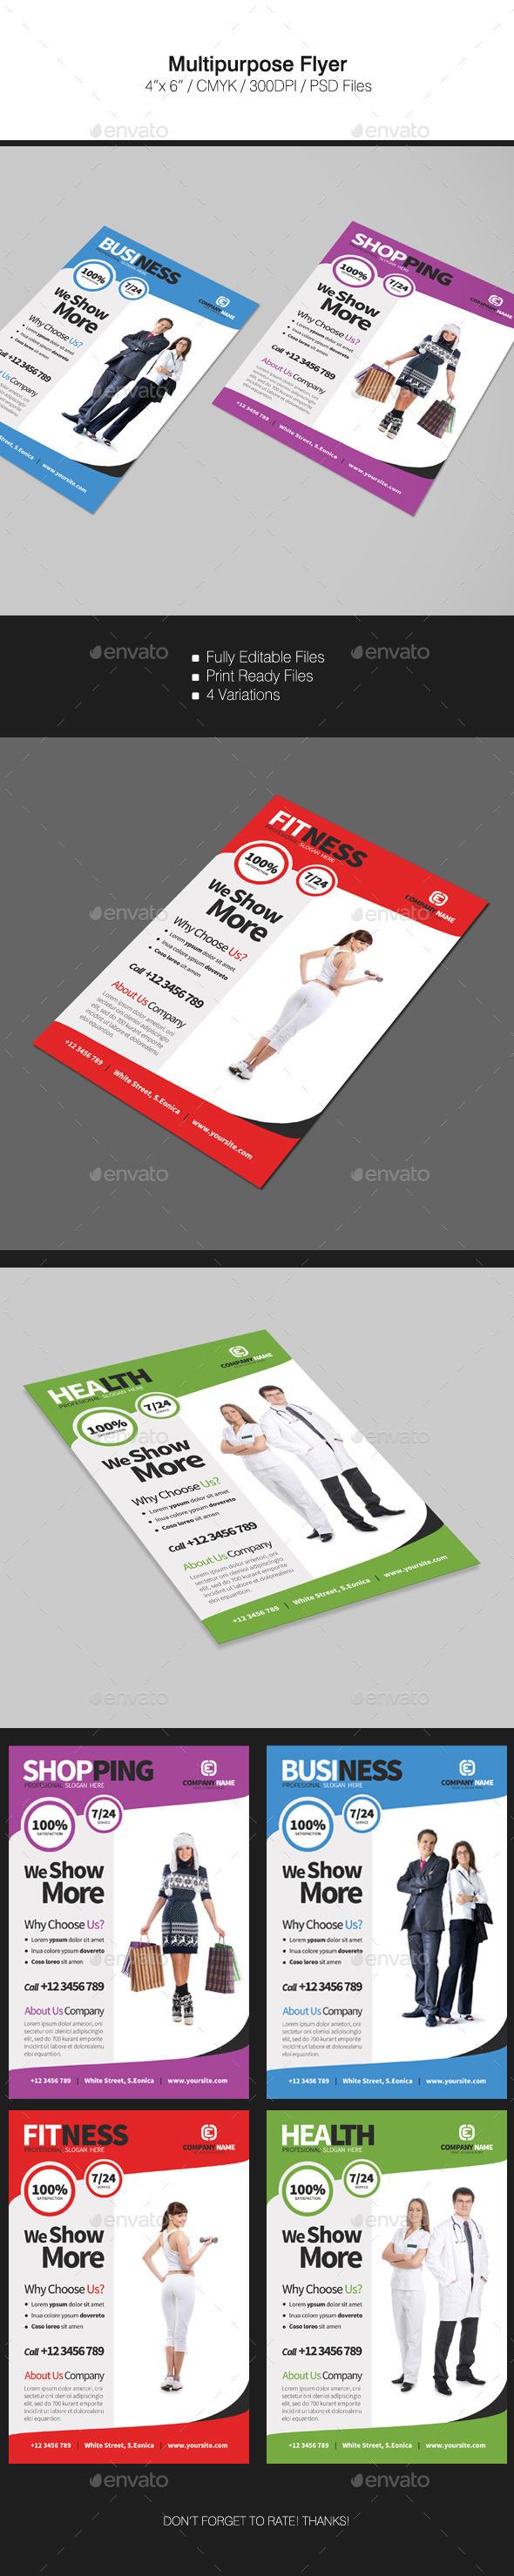 Multipurpose Flyer - Flyers Print Templates